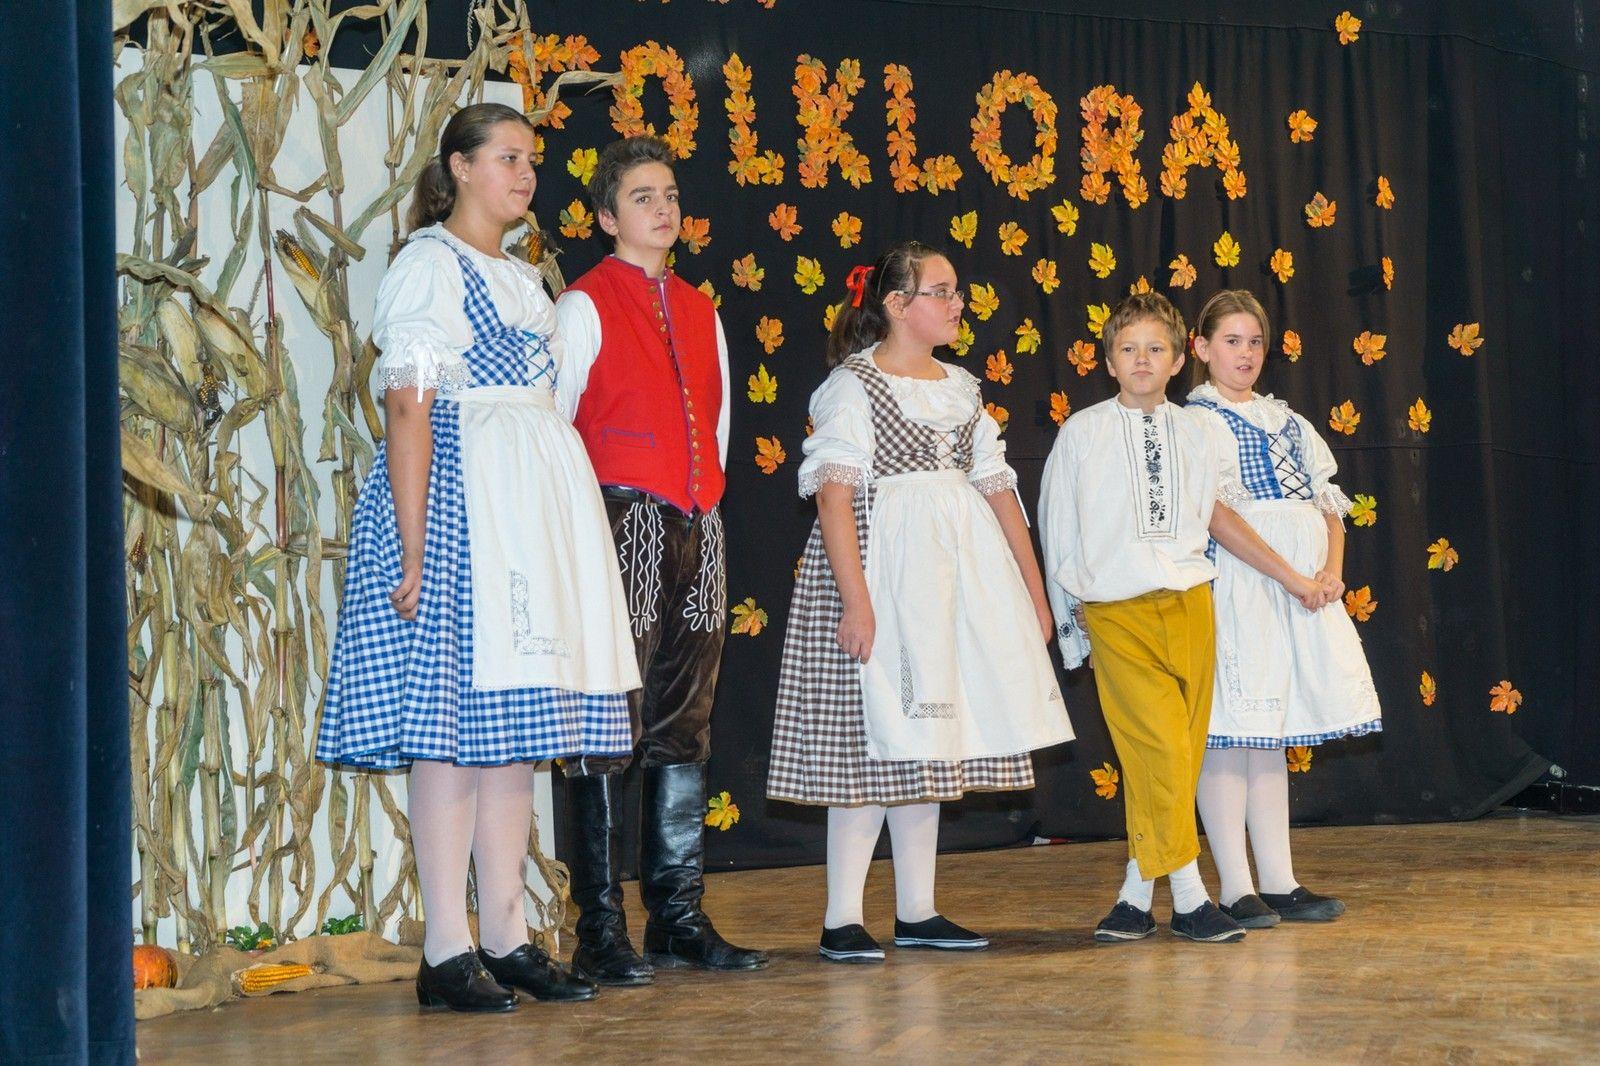 Održana tradicionalna Večer folklora Češke OBEC u bjelovarskom Domu kulture